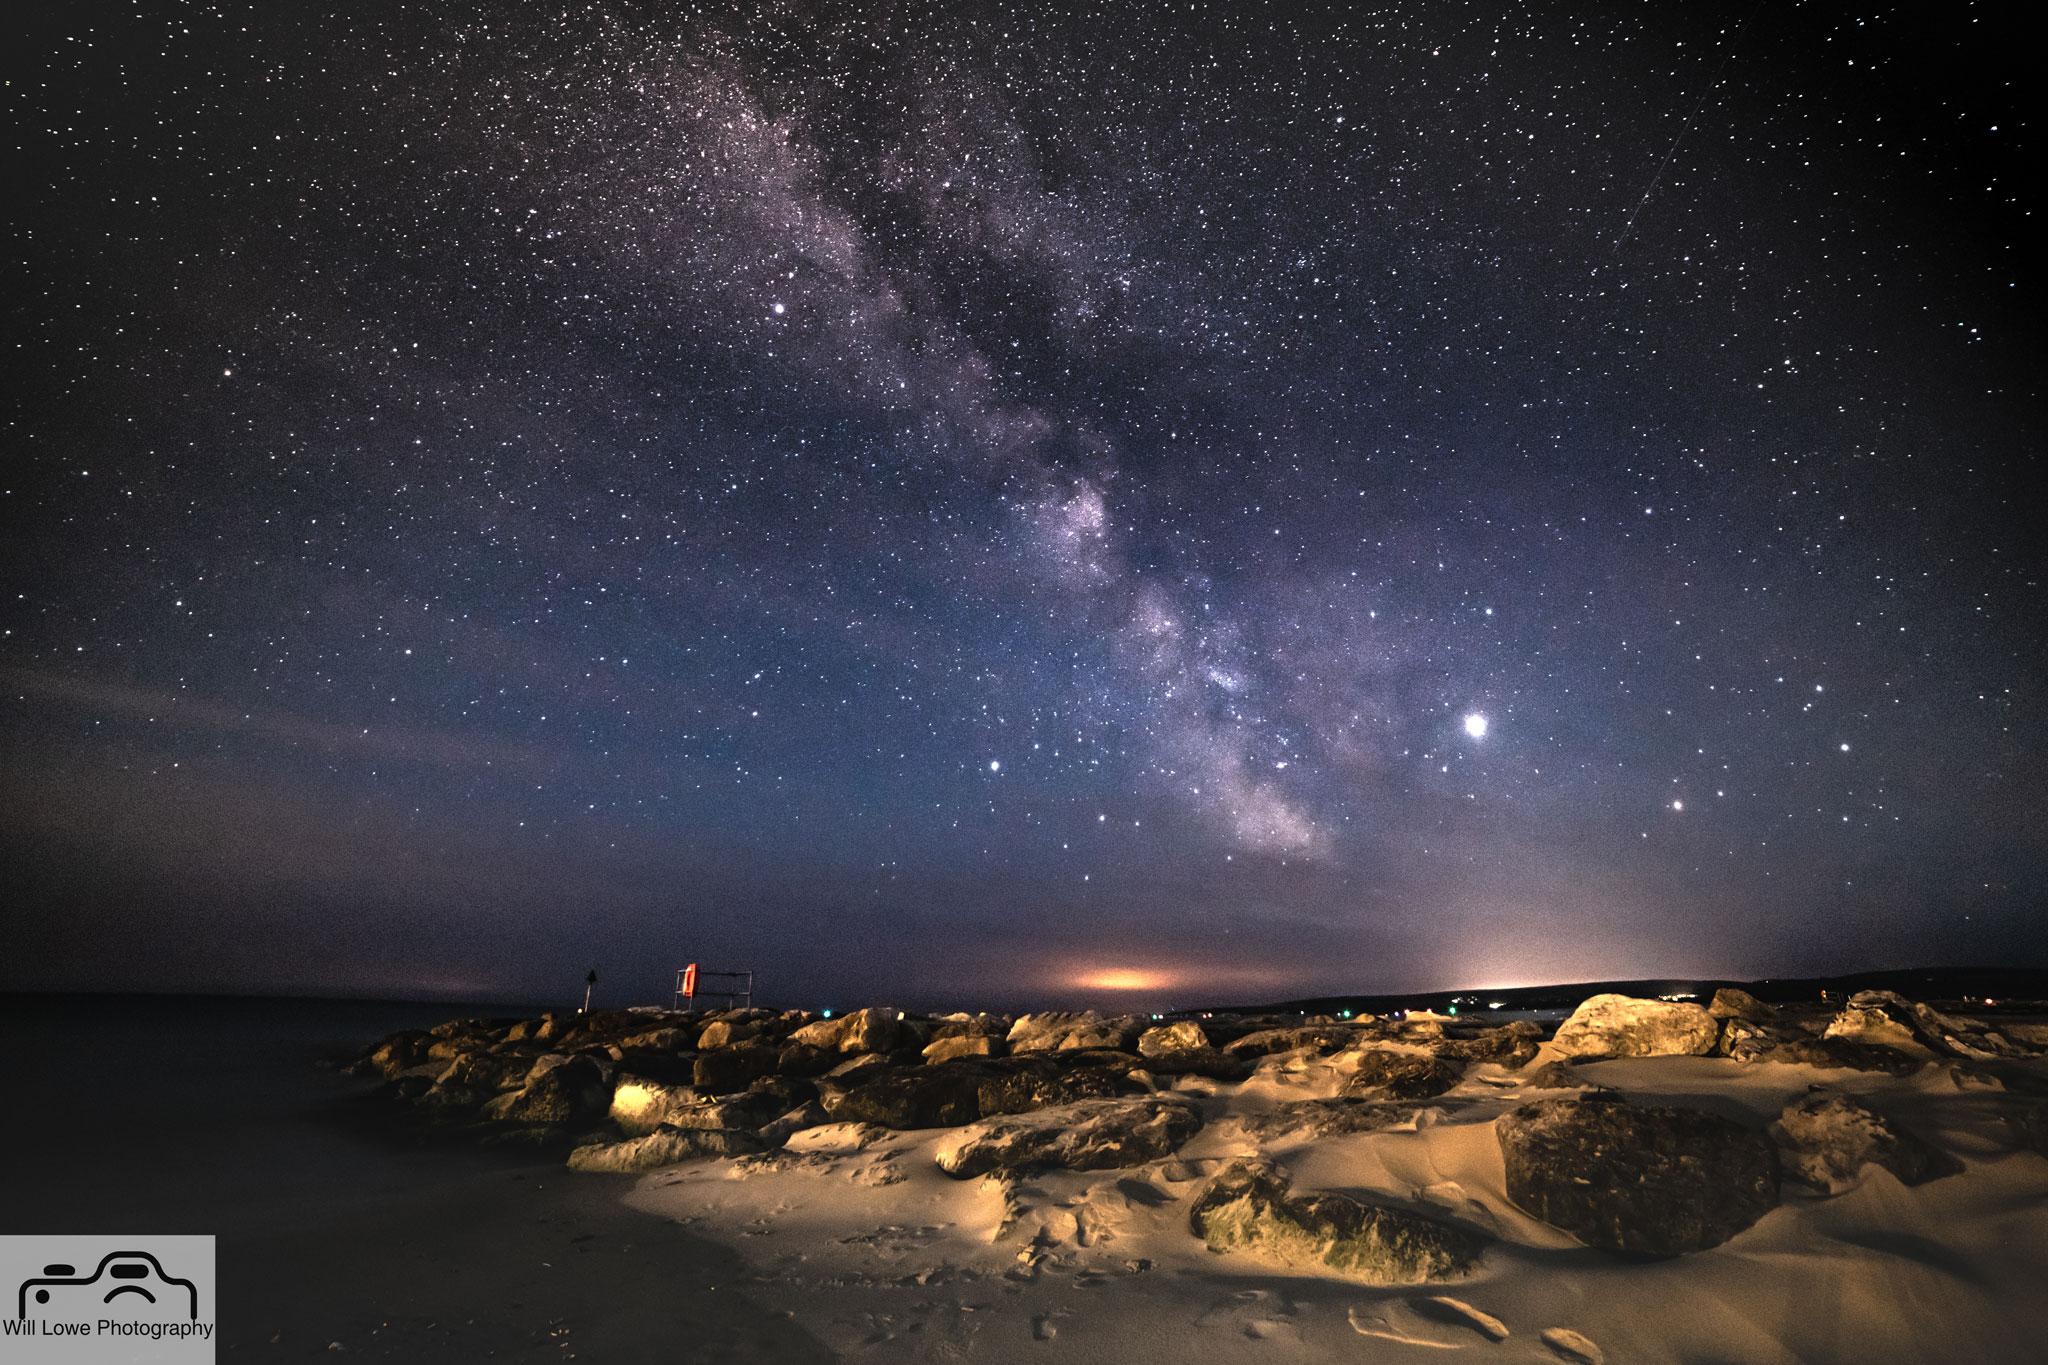 Milky Way over Sandbanks Beach